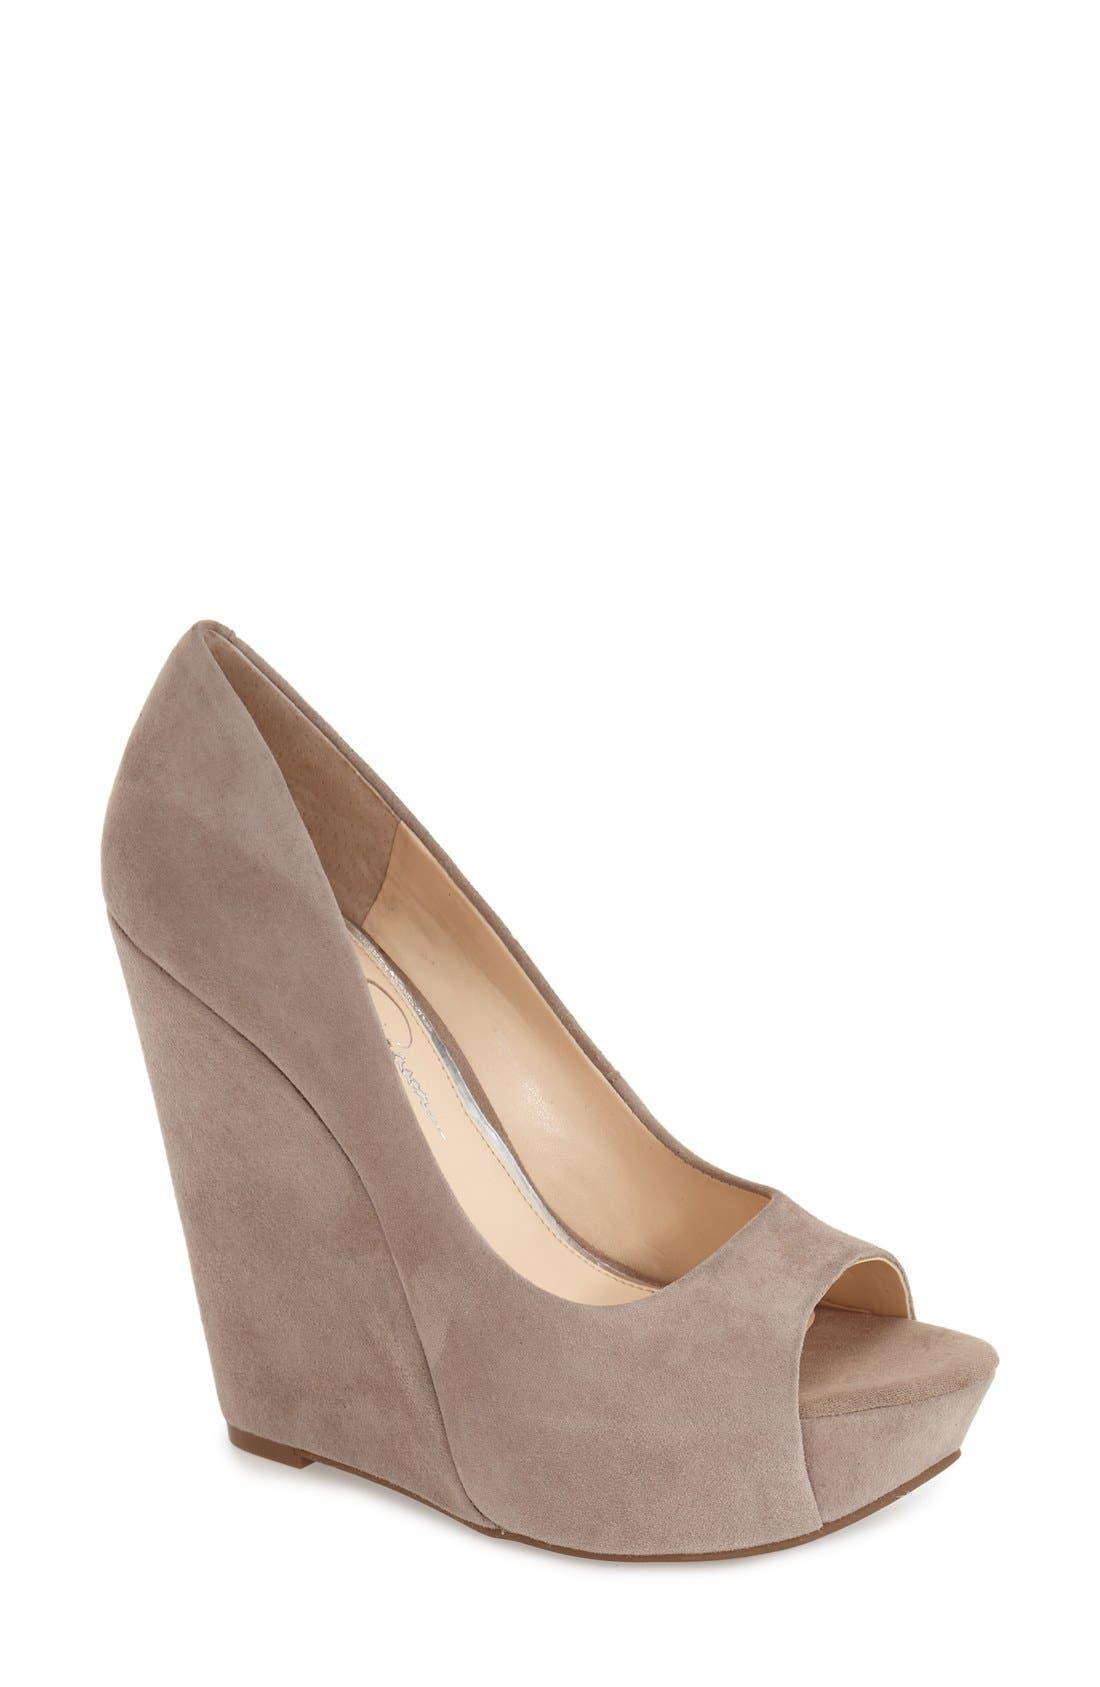 Alternate Image 1 Selected - Jessica Simpson 'Bethani' Wedge Platform Sandal (Women)